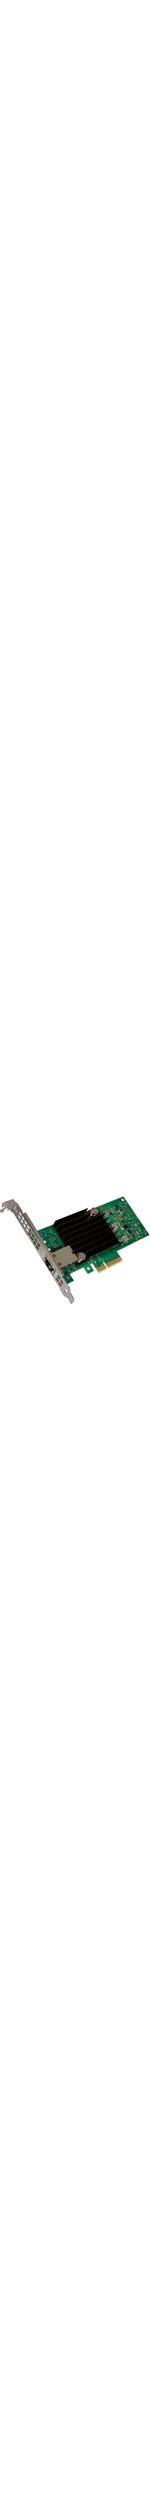 Intel X550-T1 10Gigabit Ethernet Card for Server - PCI Express 3.0 x16 - 1 Ports - 1 - Twisted Pair - Bulk